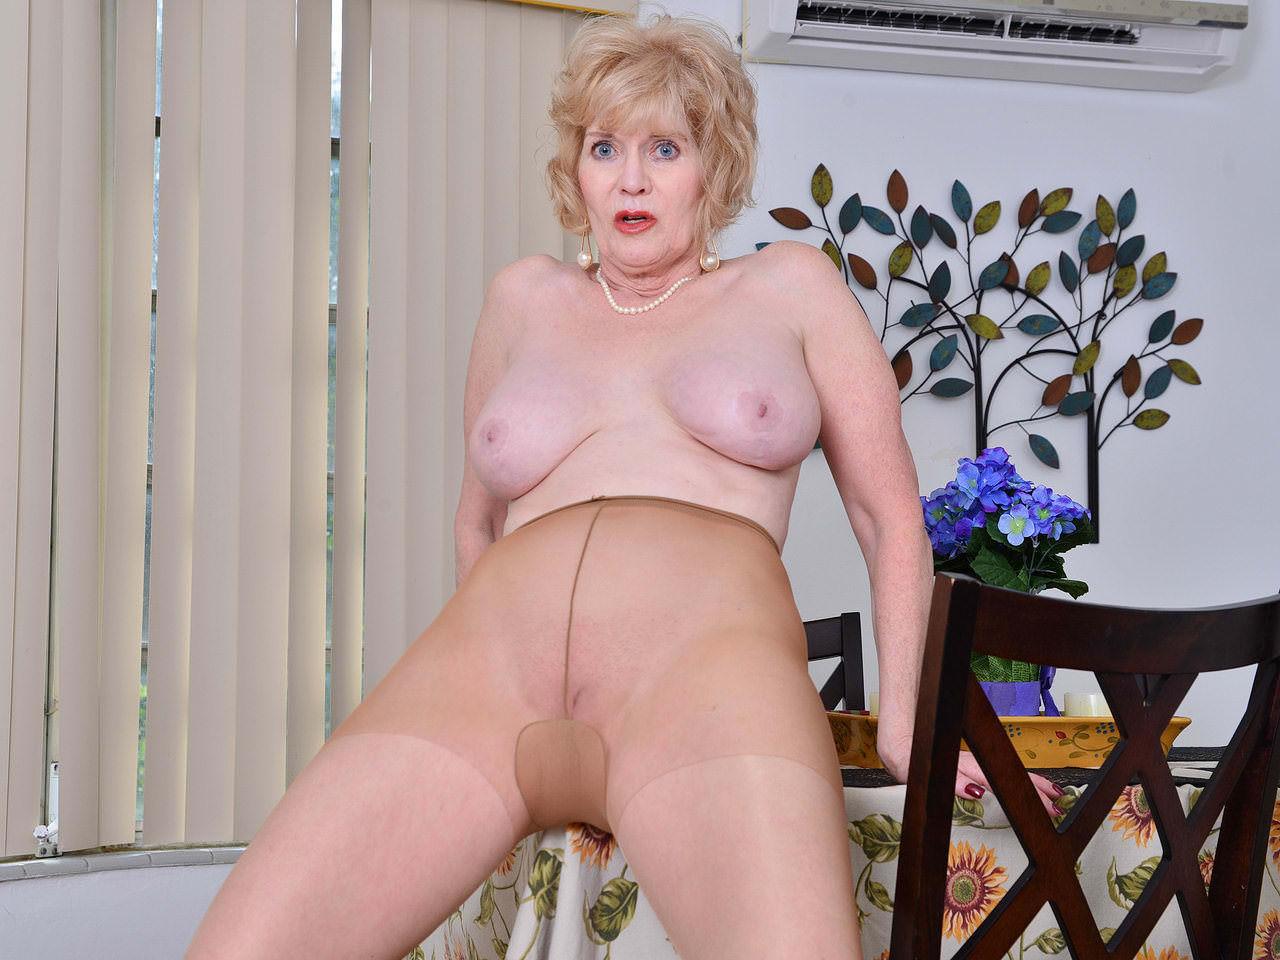 Matures,Milf,Grannies,Pantyhose,American,Older Woman Fun,HD Videos